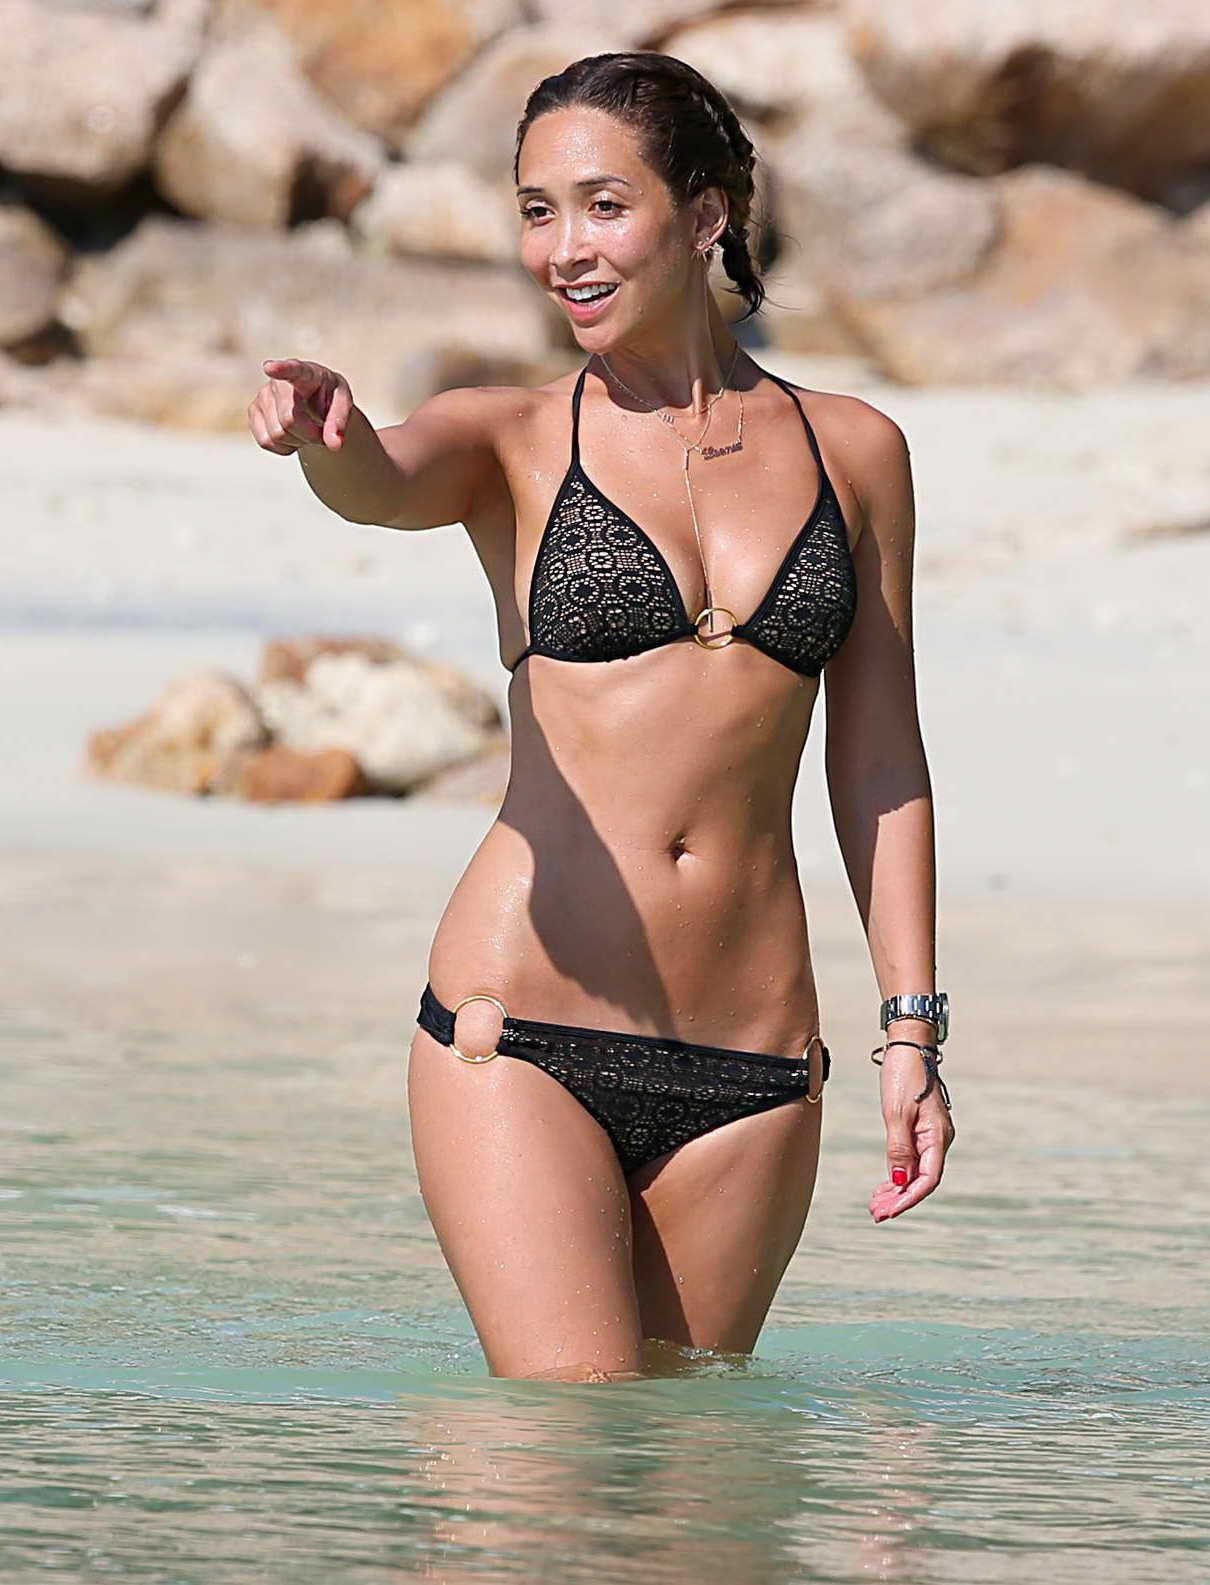 Myleene klass in bikini at the beach in thailand 03 14 2016 9